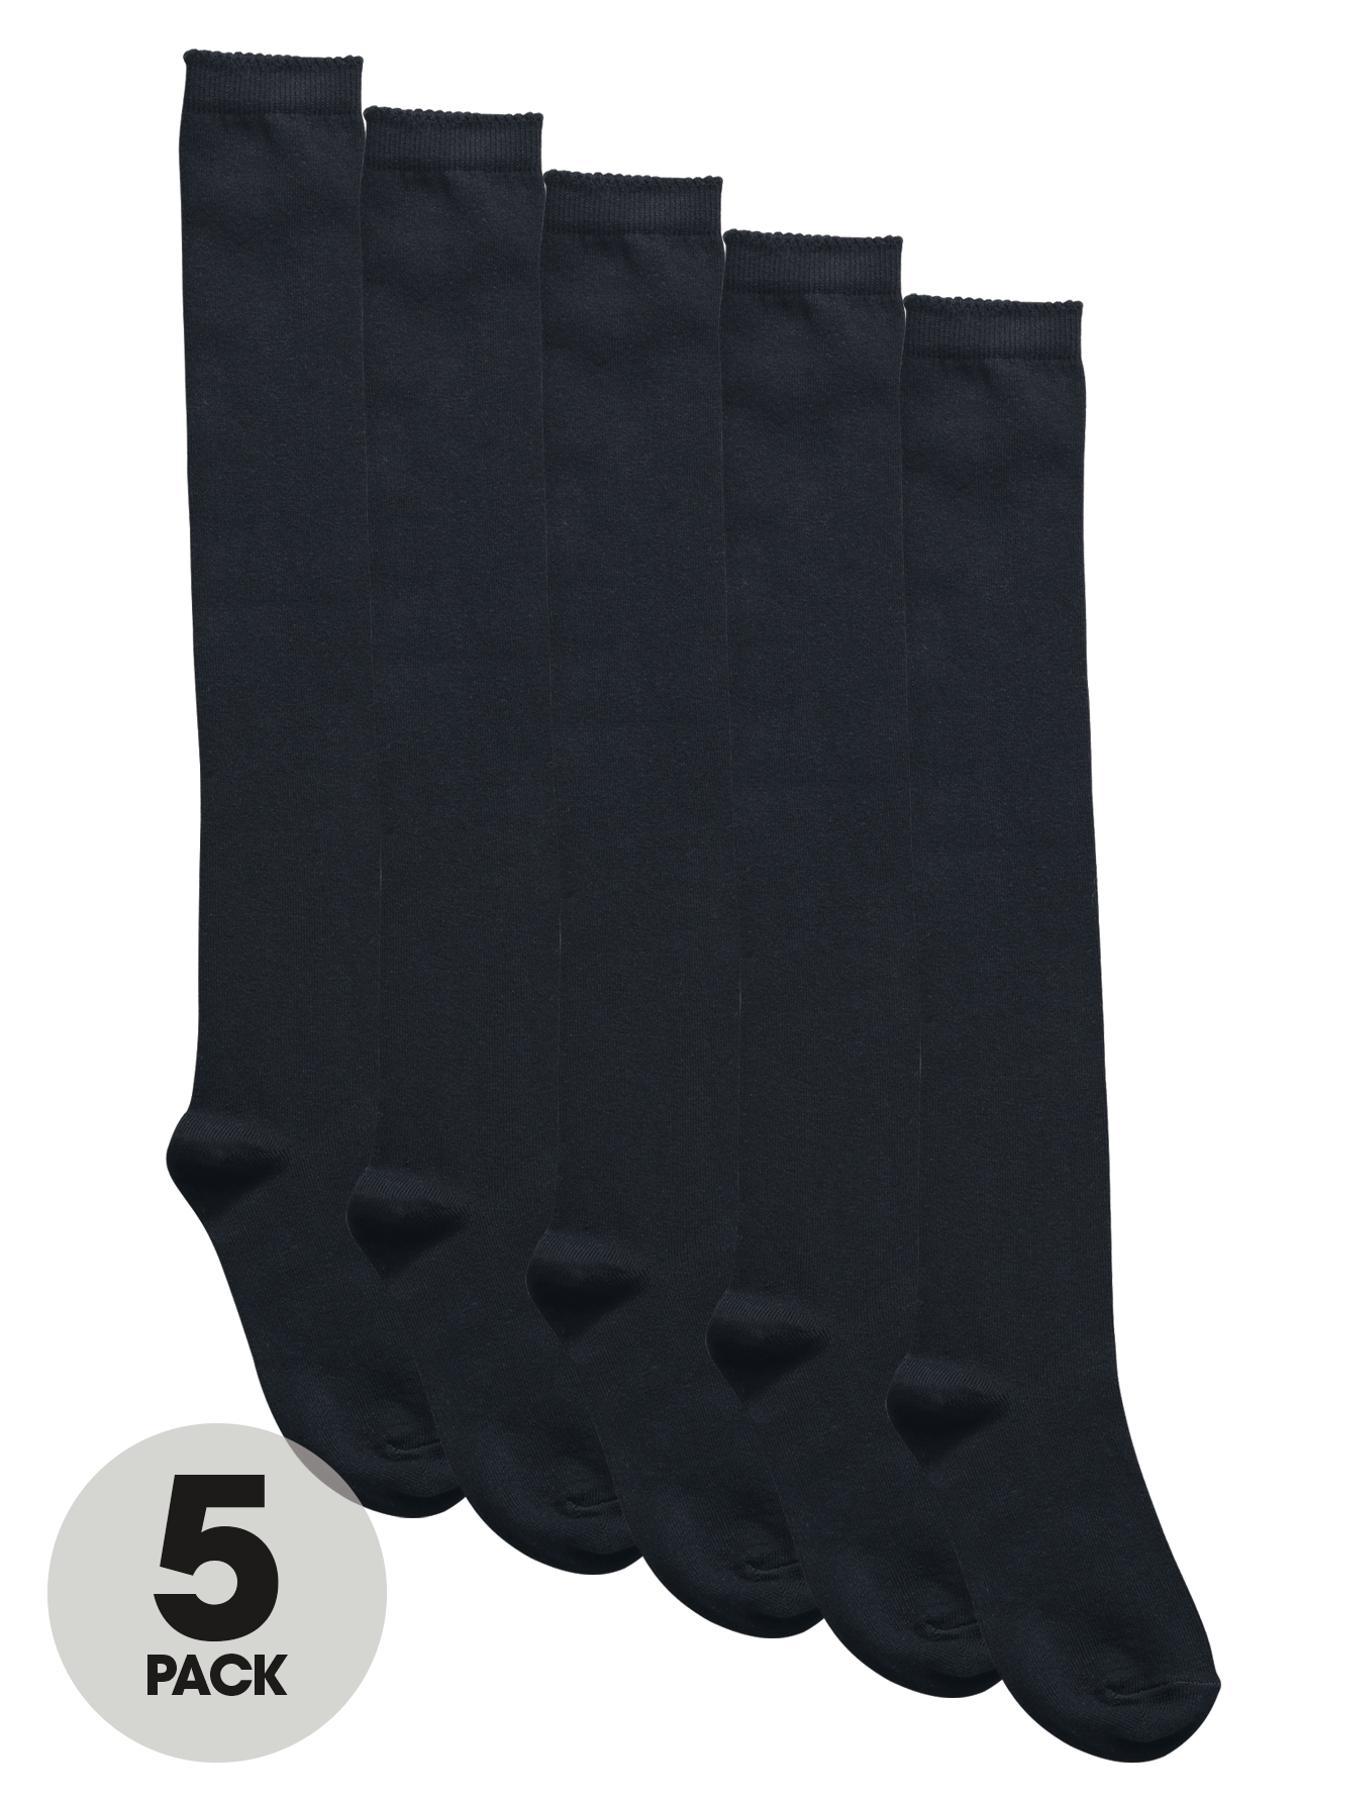 Girls Long School Socks (5 Pack), Black,Grey,Navy at Littlewoods